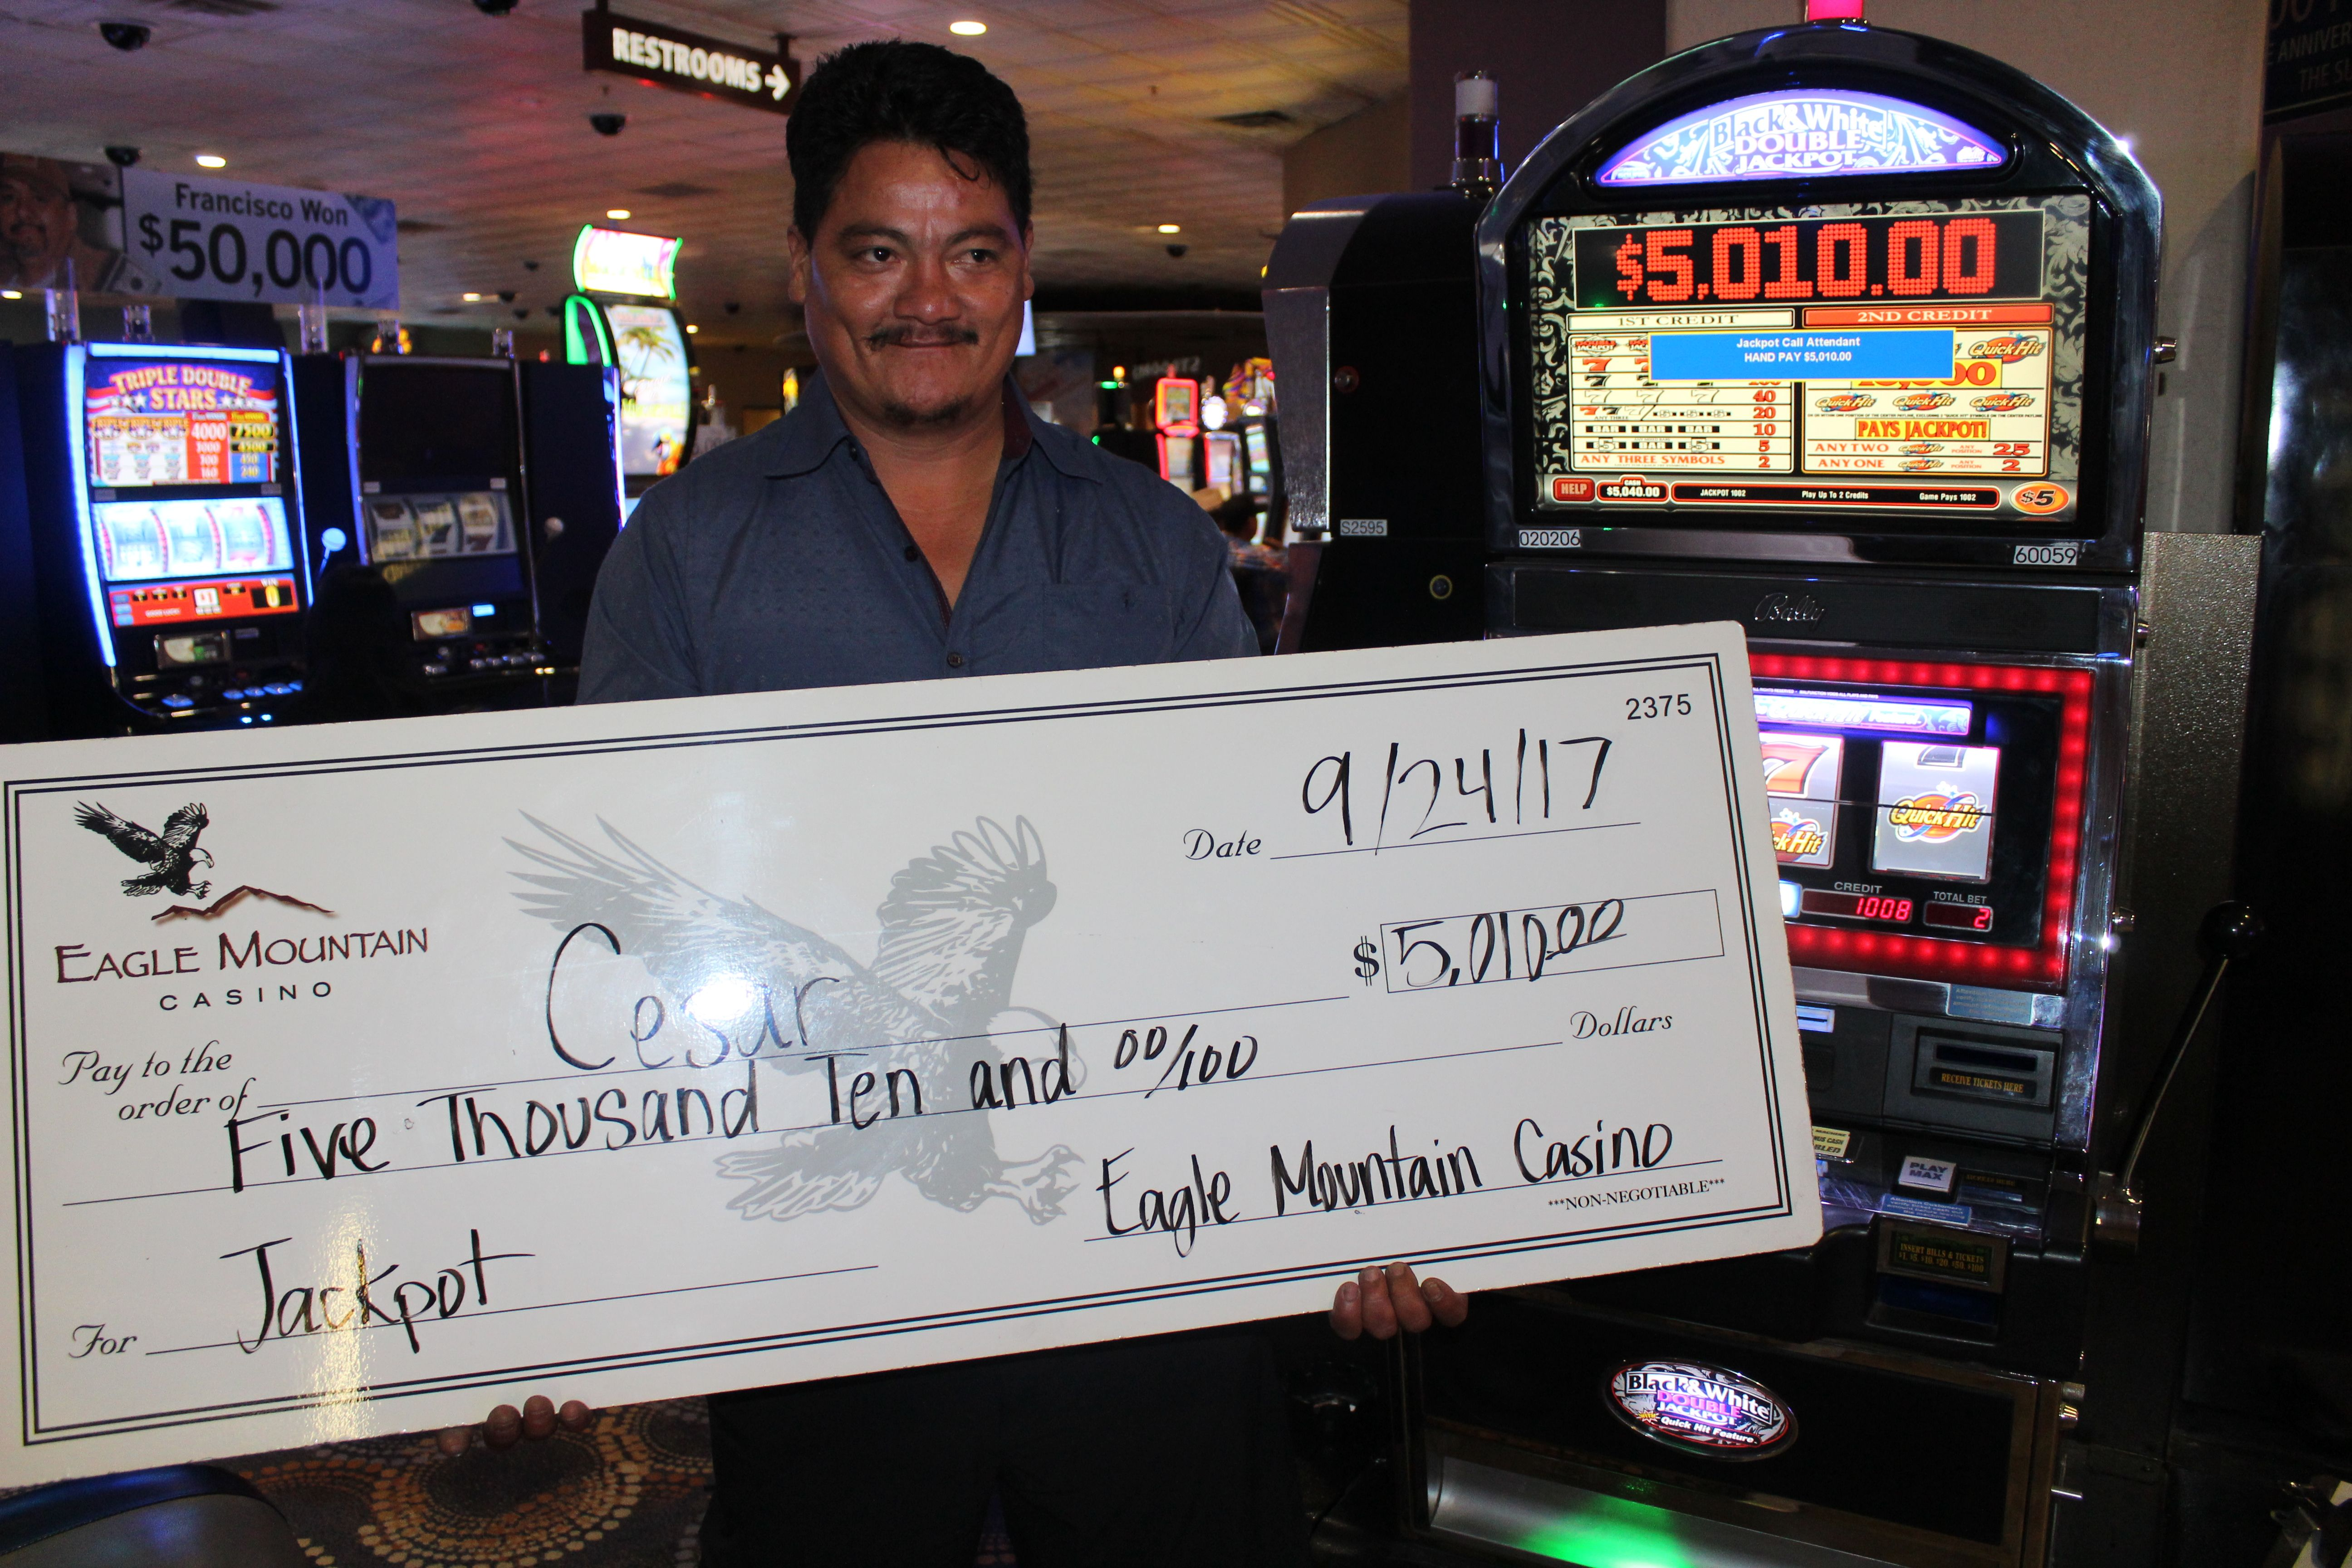 Eagle mountain casino slot machines eric cartman sings poker face